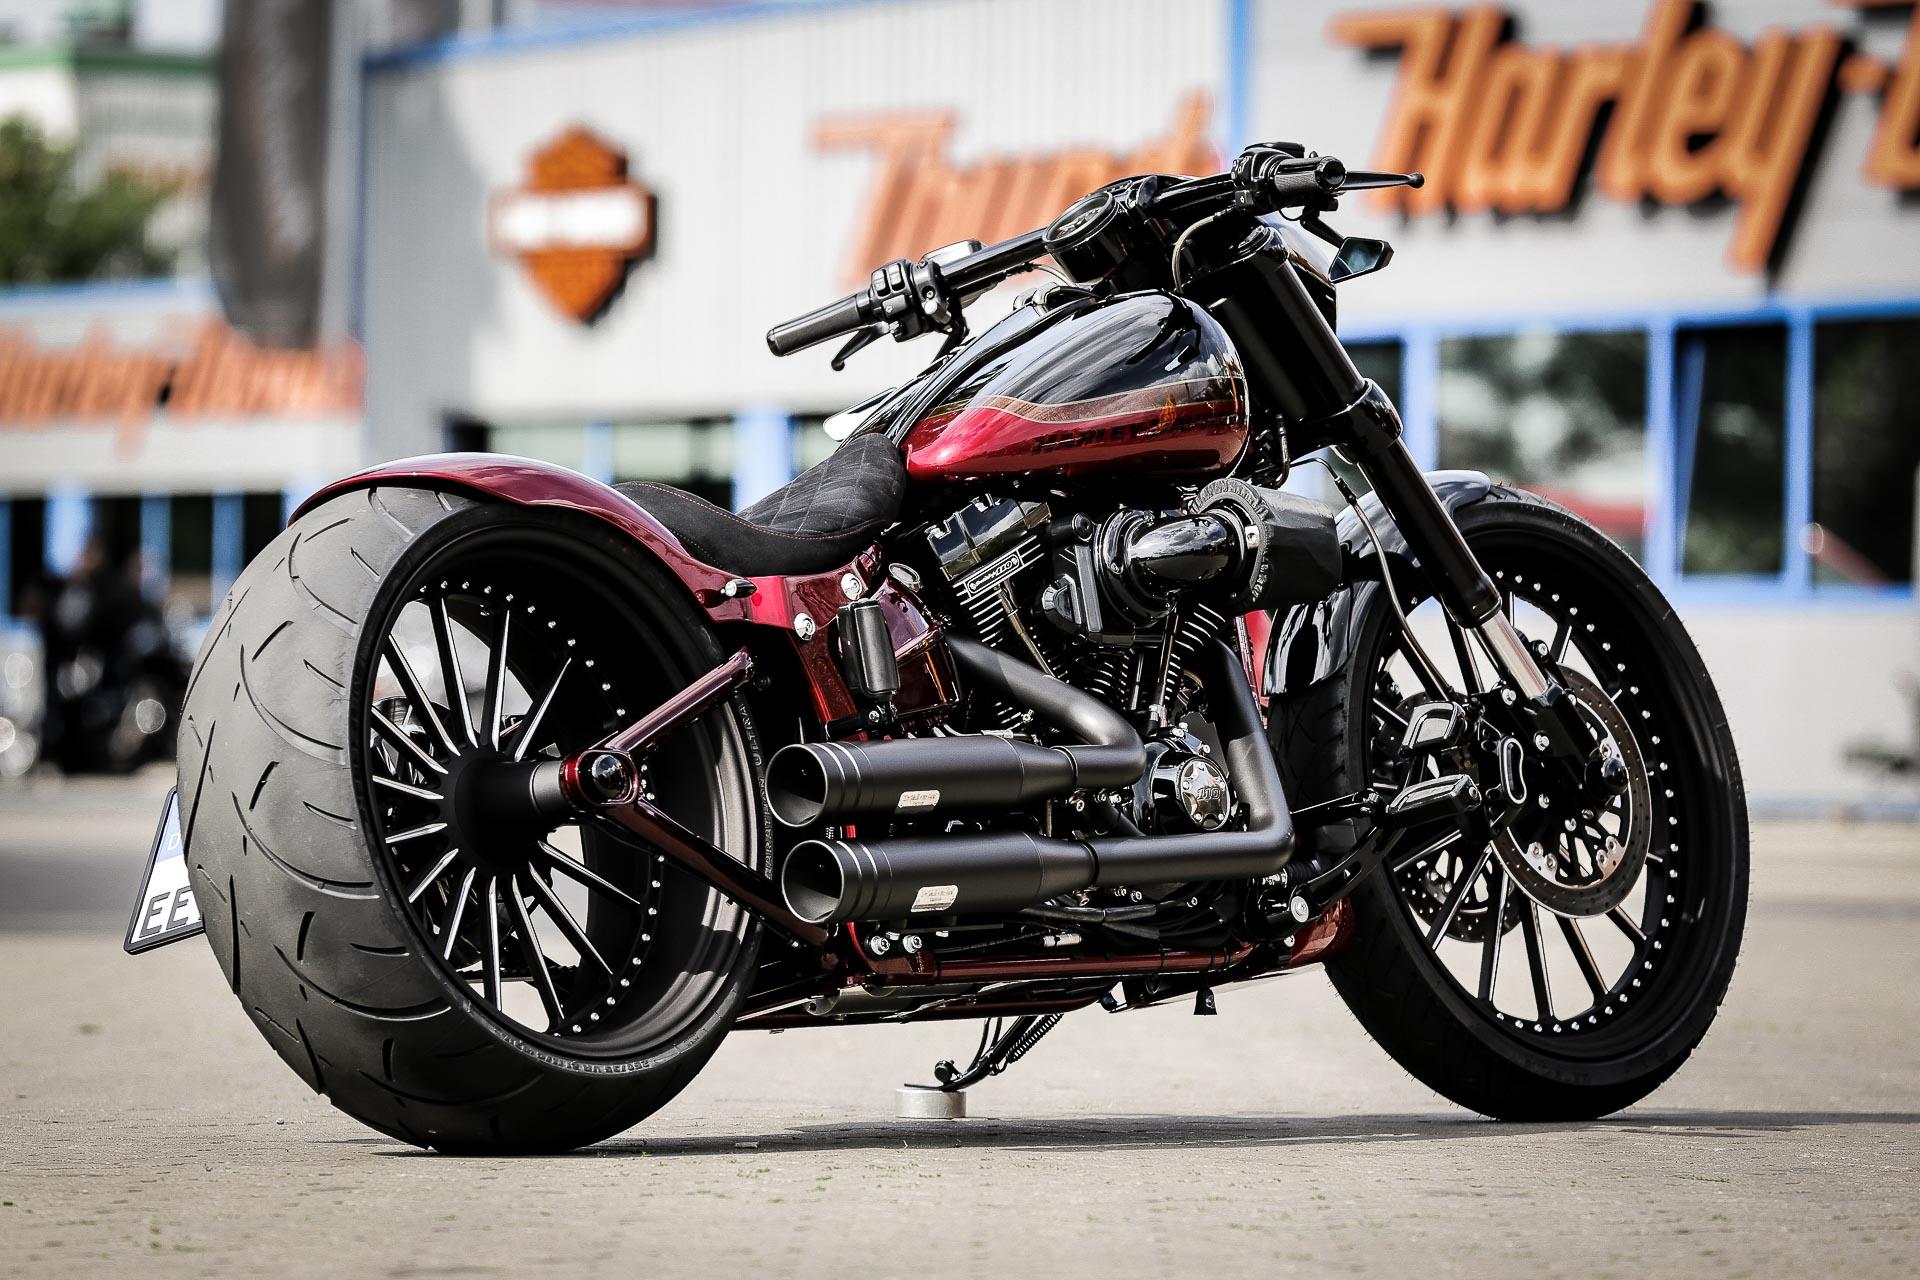 Harley Breakout Cvo >> Thunderbike Nobleout • H-D FXSE Breakout CVO Custom Motorcycle